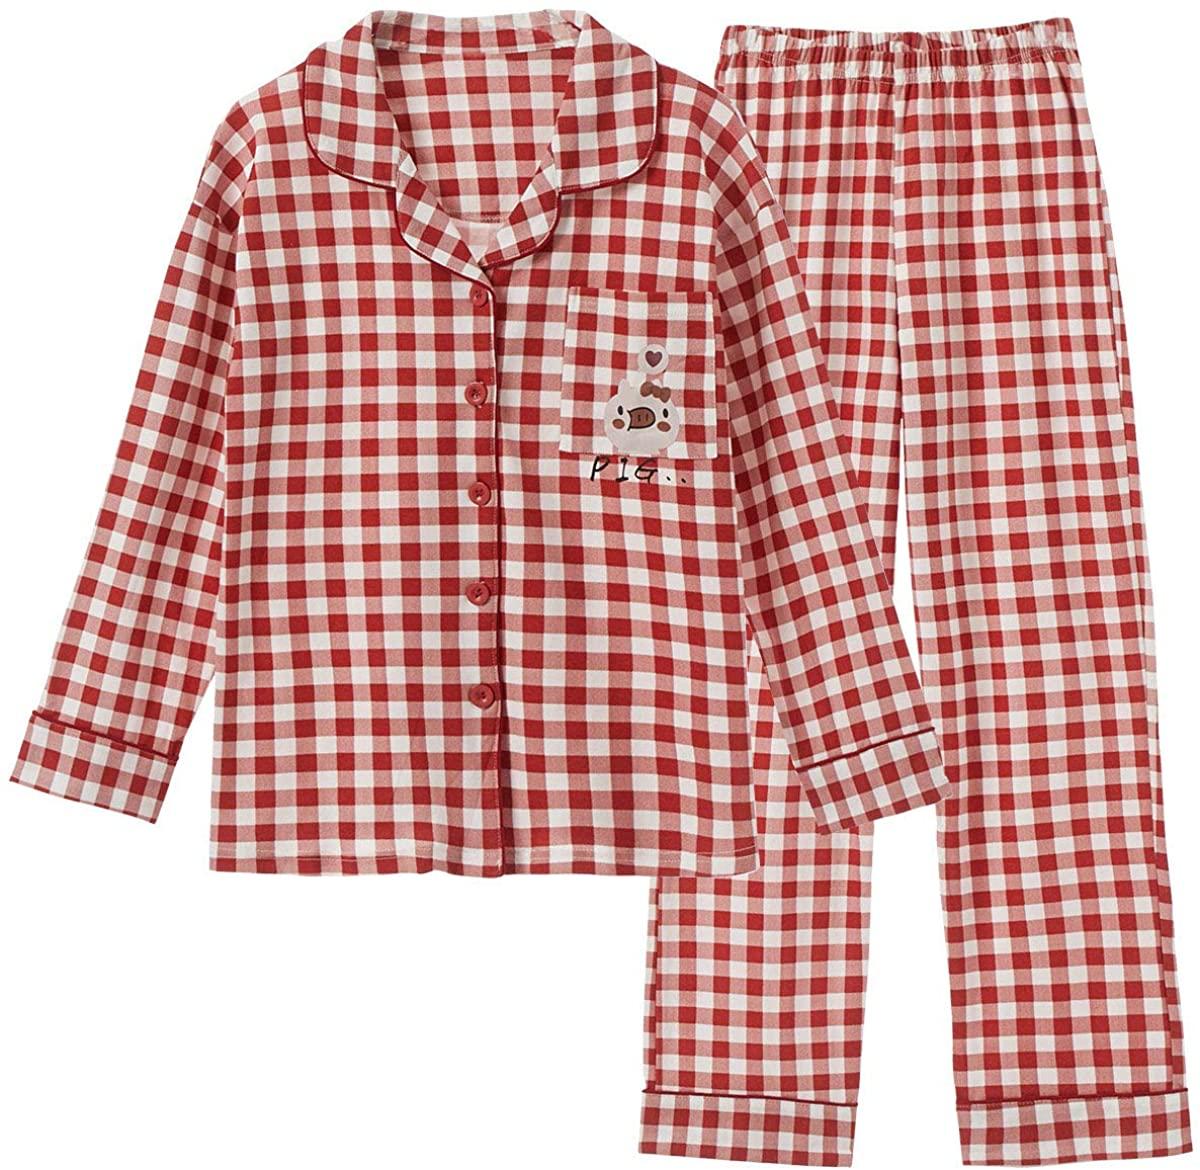 TOP-MAX Girls Pajamas Size 12 14 16 18- Button Down Pjs for Teen Tween Big Girls Cartoon Tops and Long Pants Loungwear …